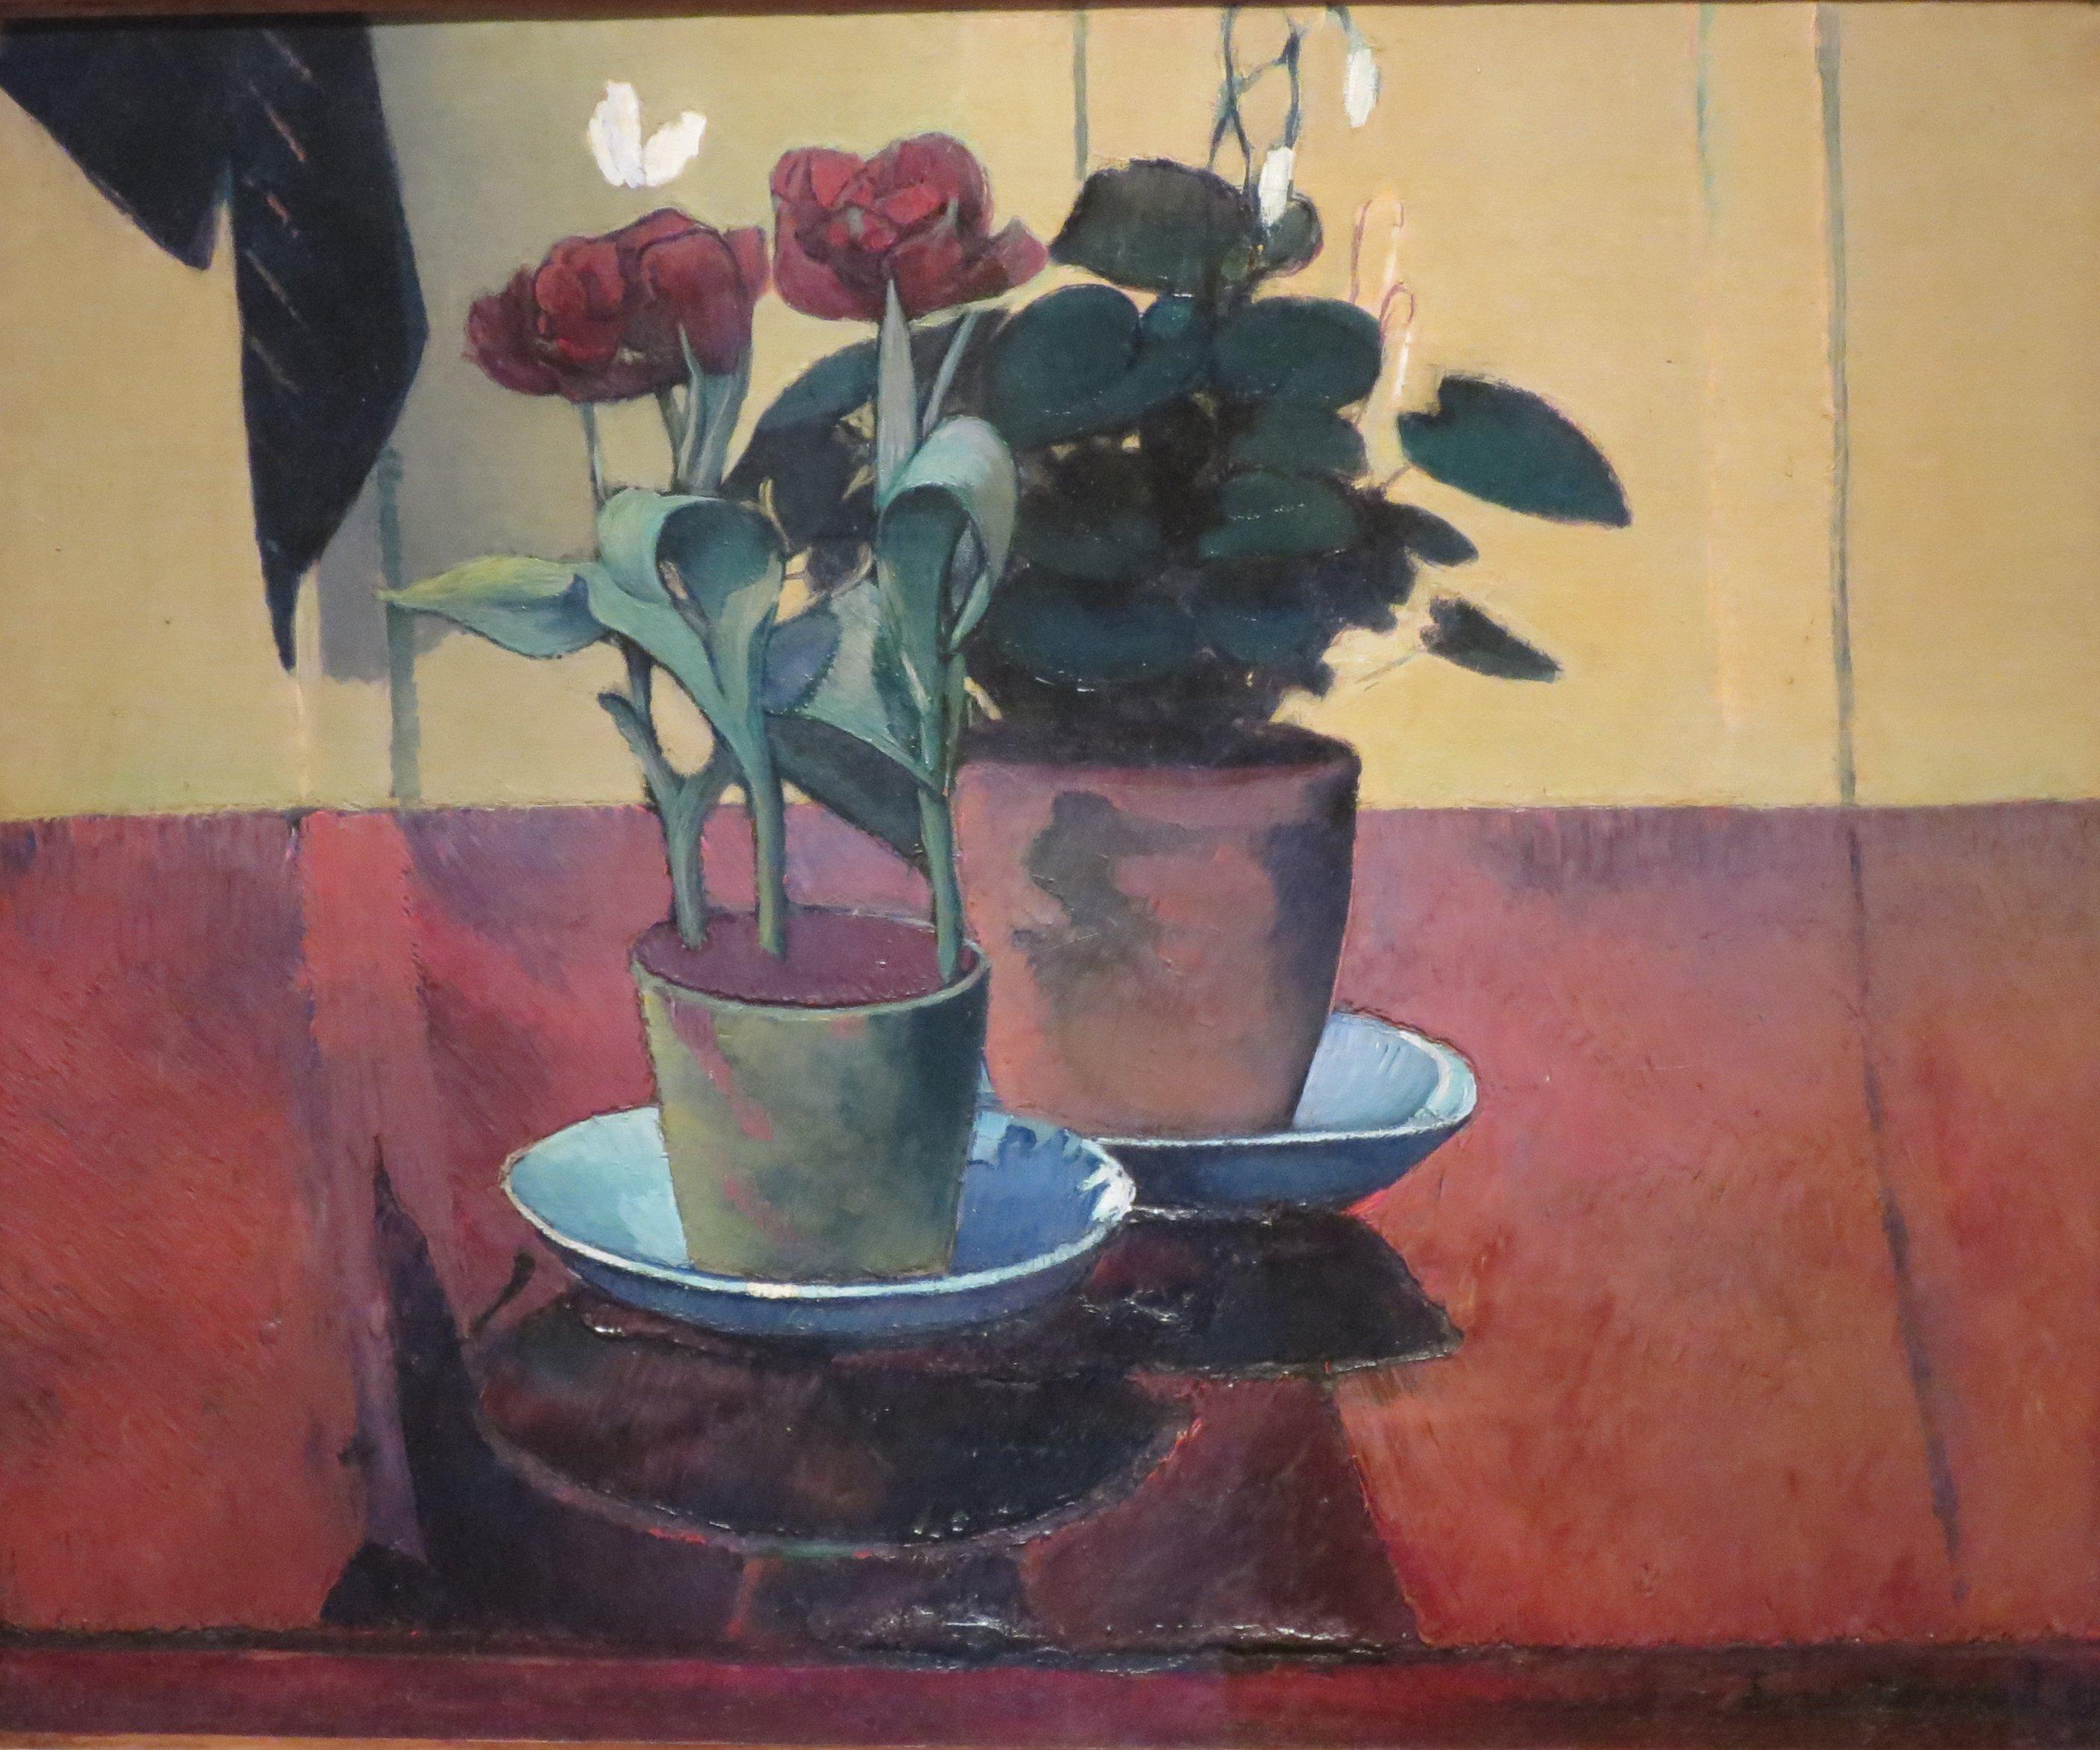 fitxerstill life with flowers by 201mile bernard norton